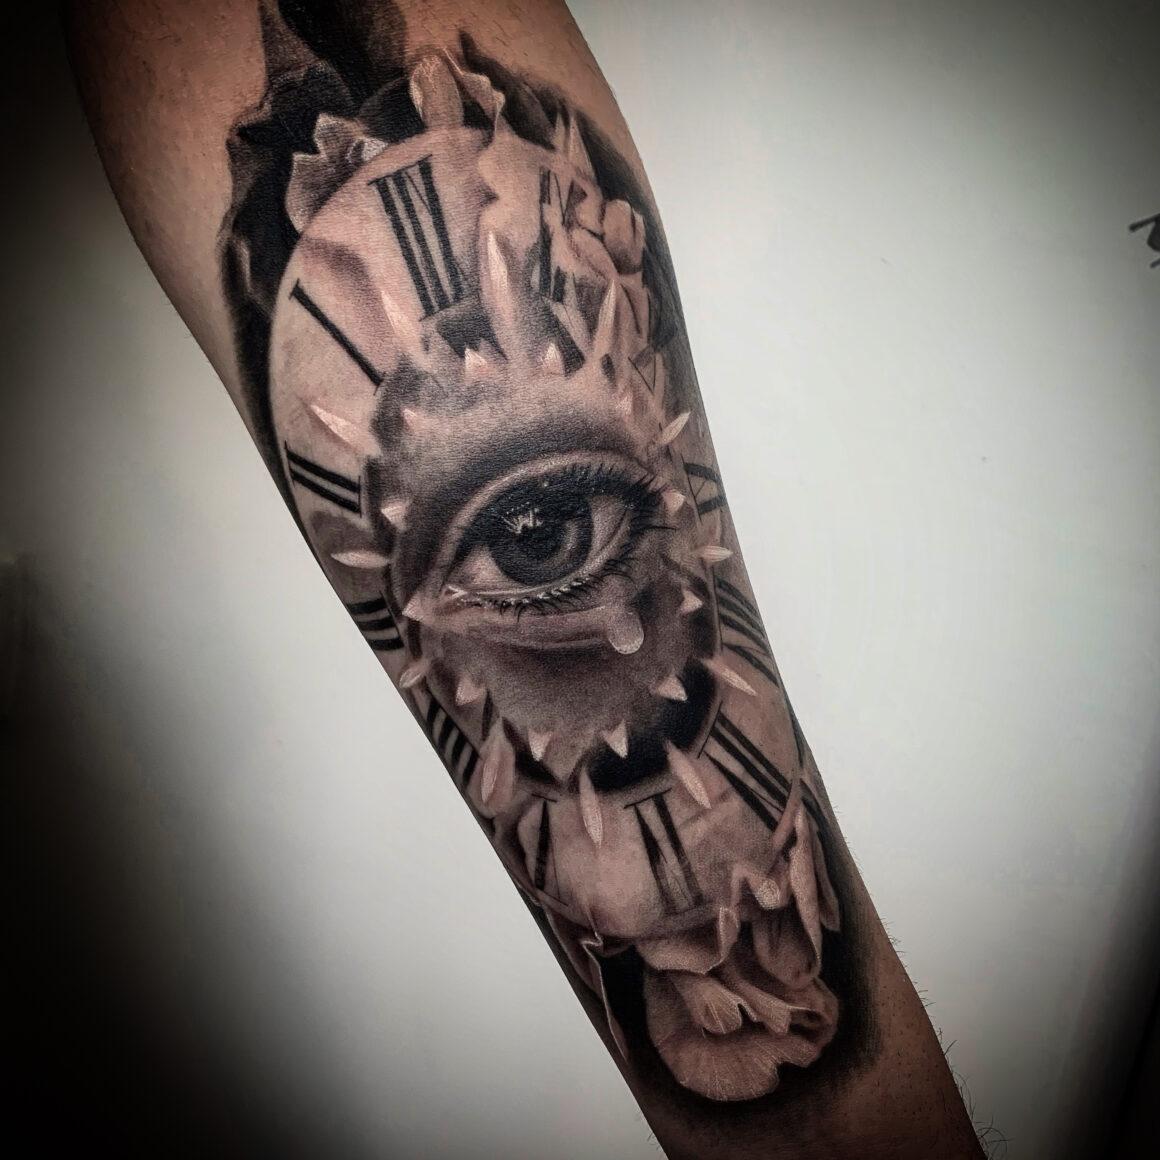 Mauro Alberti, InKing Tattoo Studio, Caldogno, Vicenza